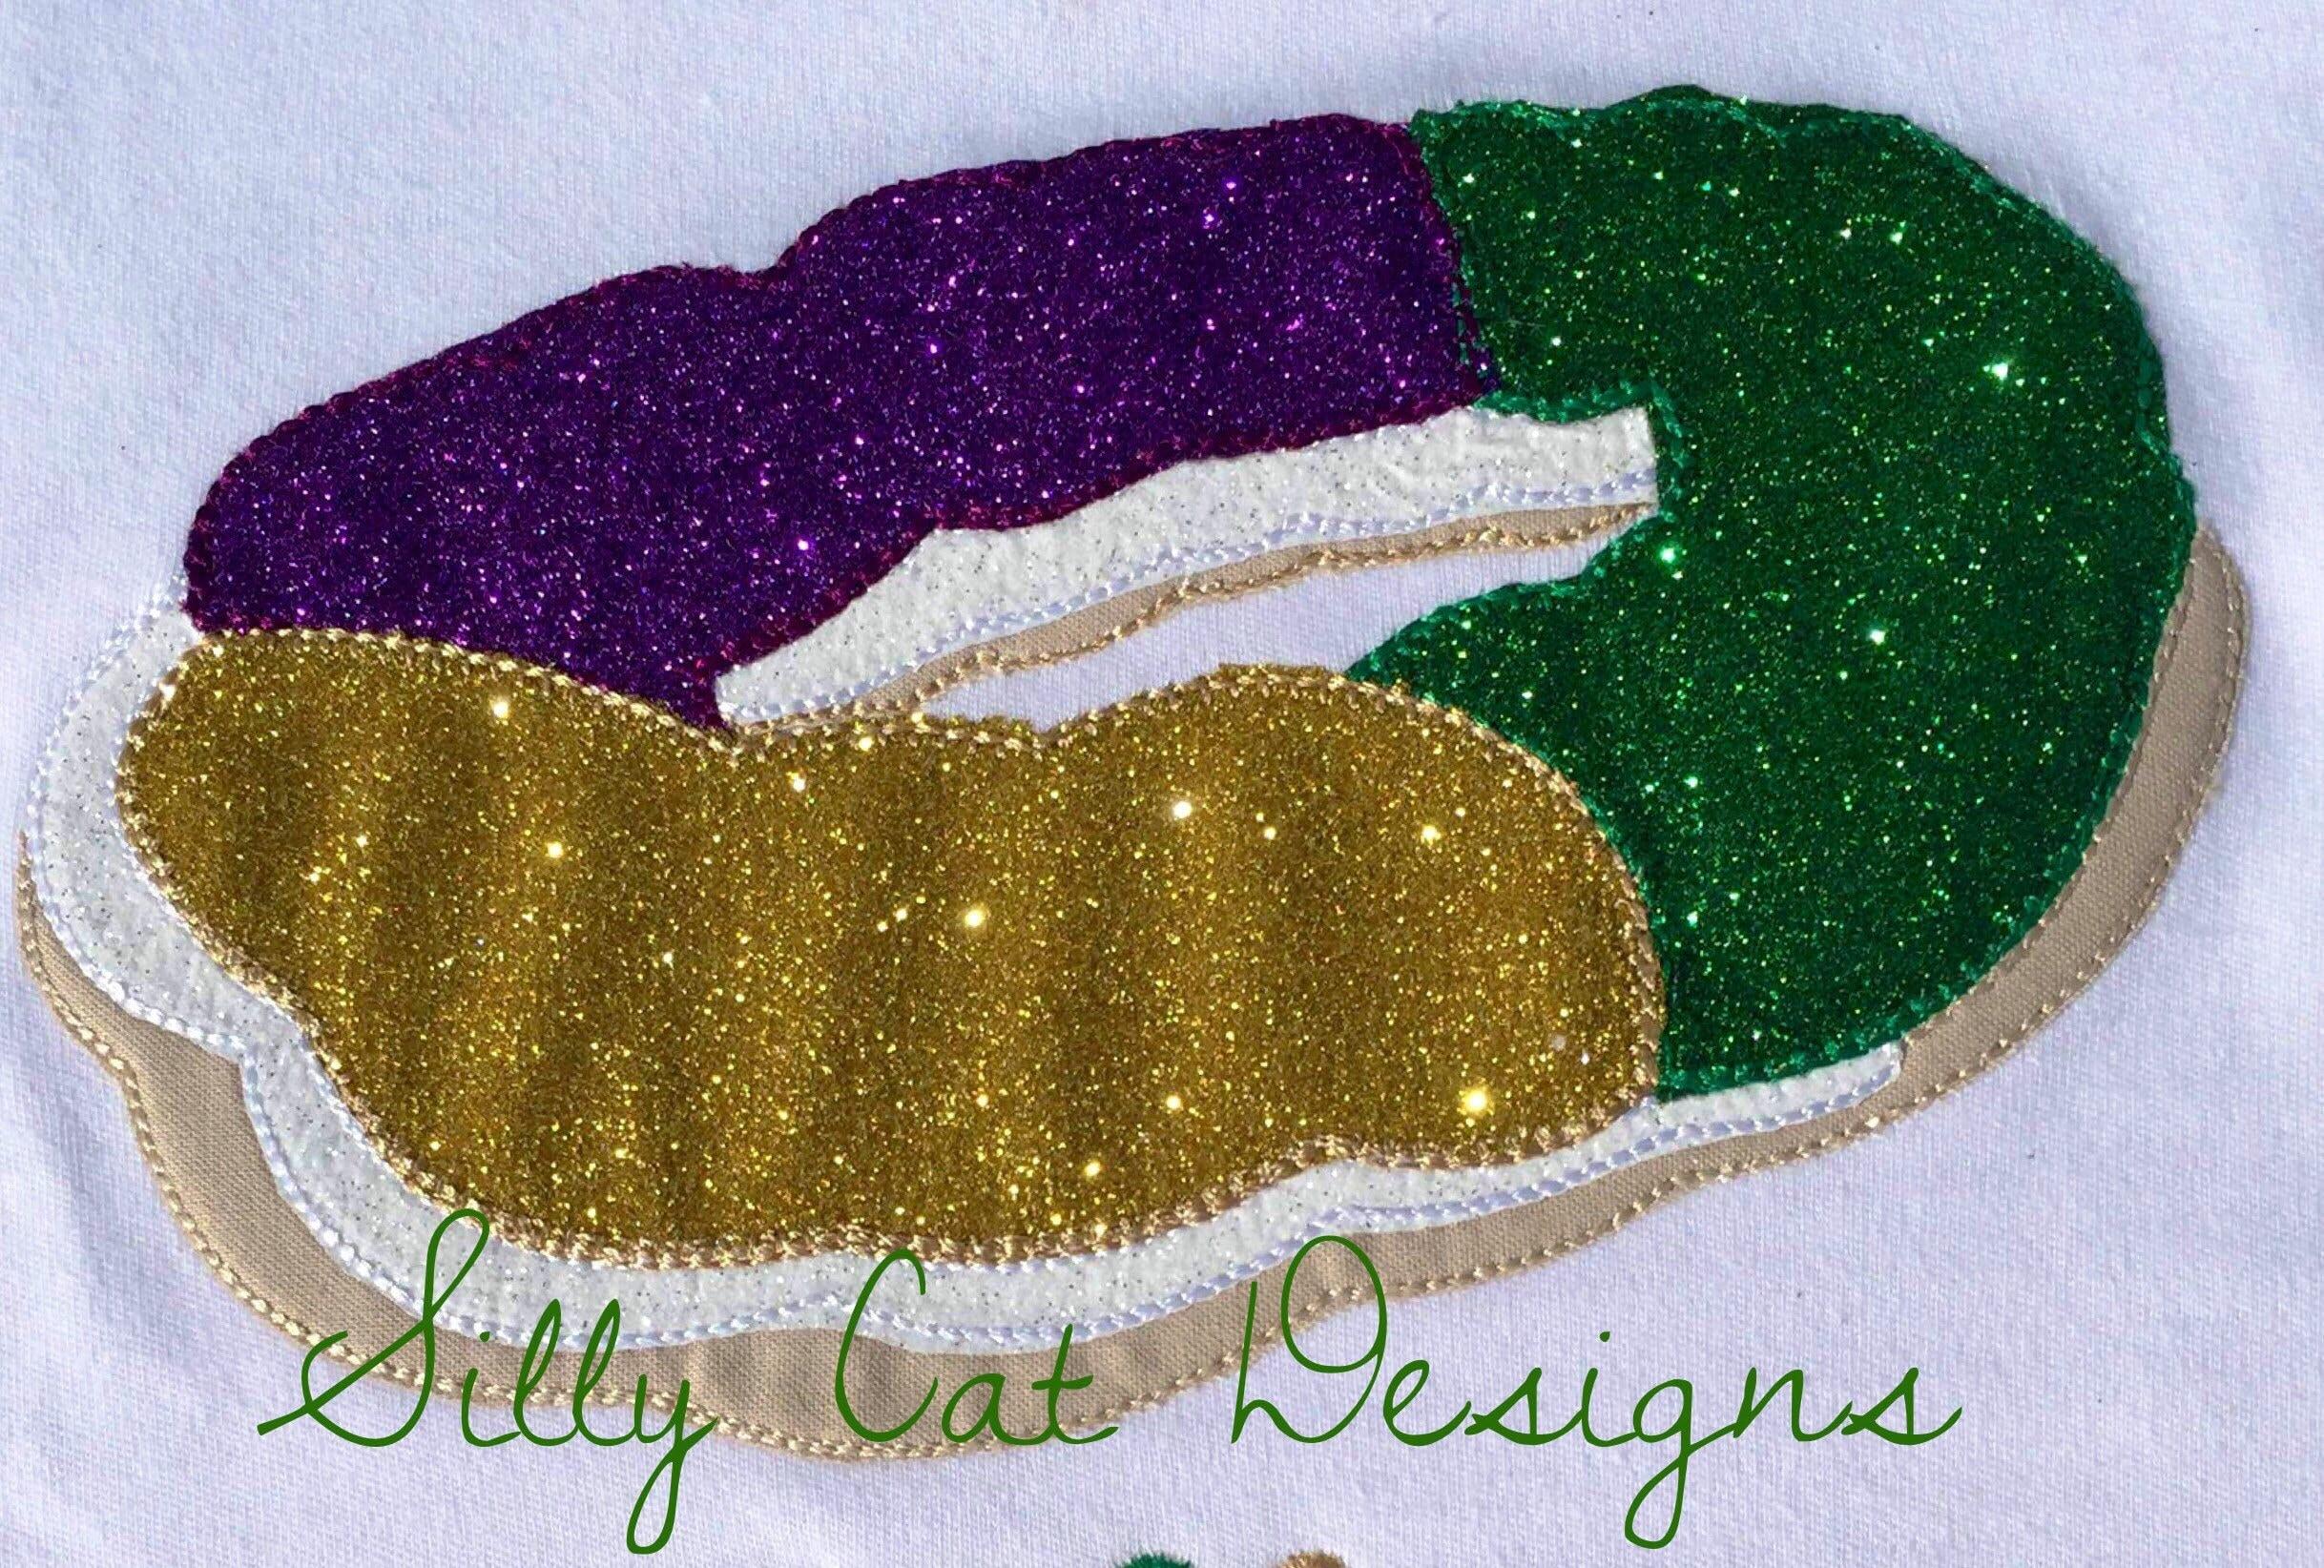 Vintage Mardi Gras King Cake Applique Design